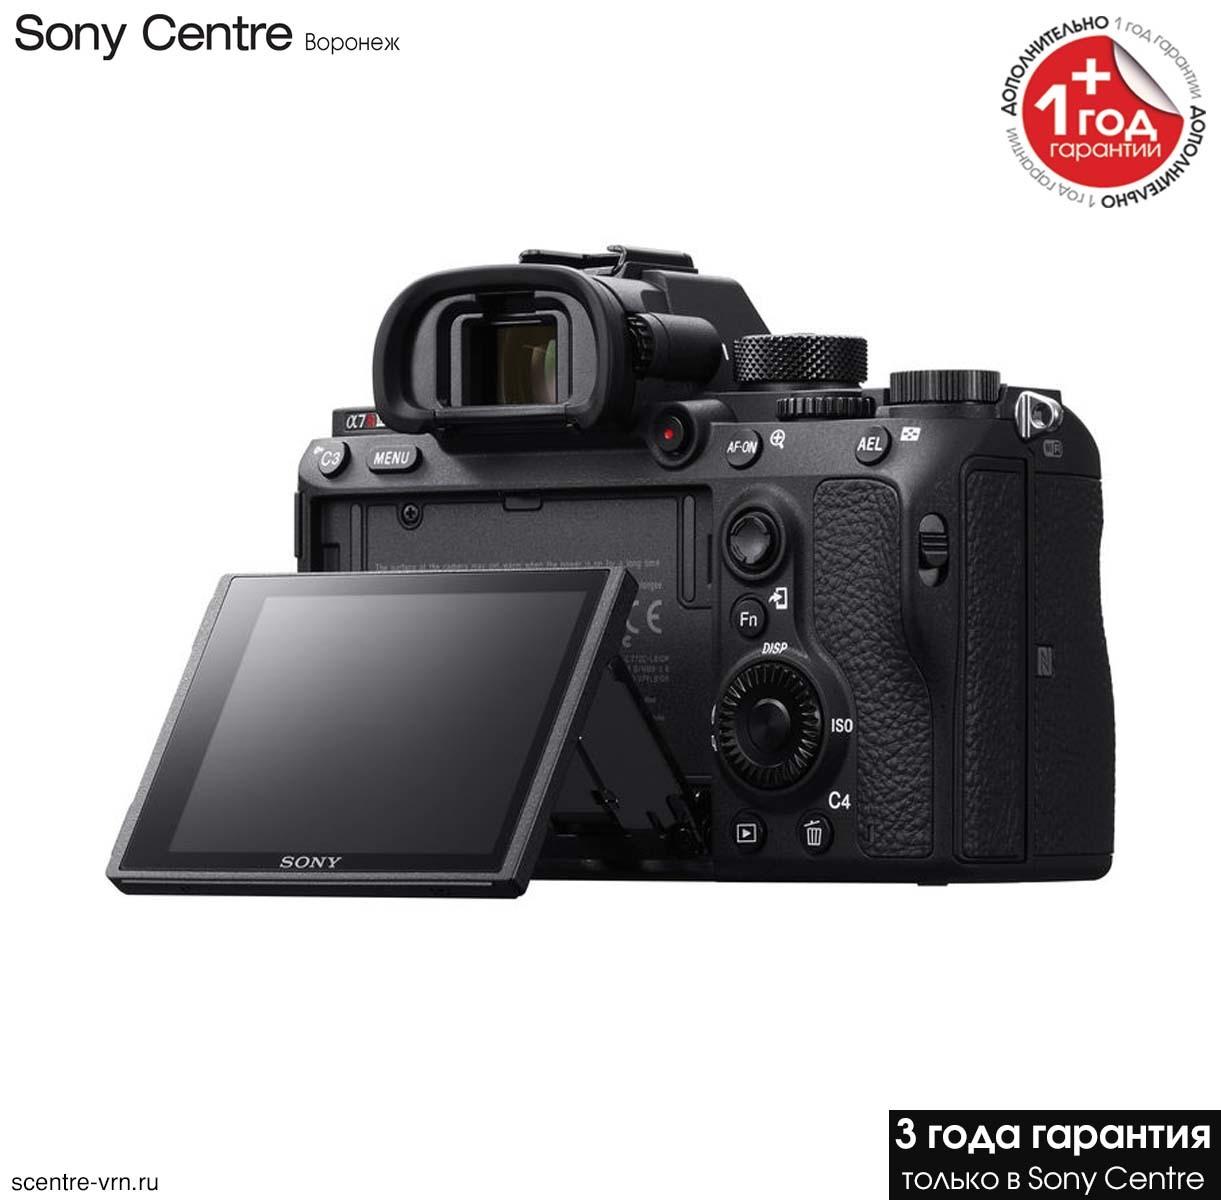 Фотоаппарат Sony Alpha 7R3 Body